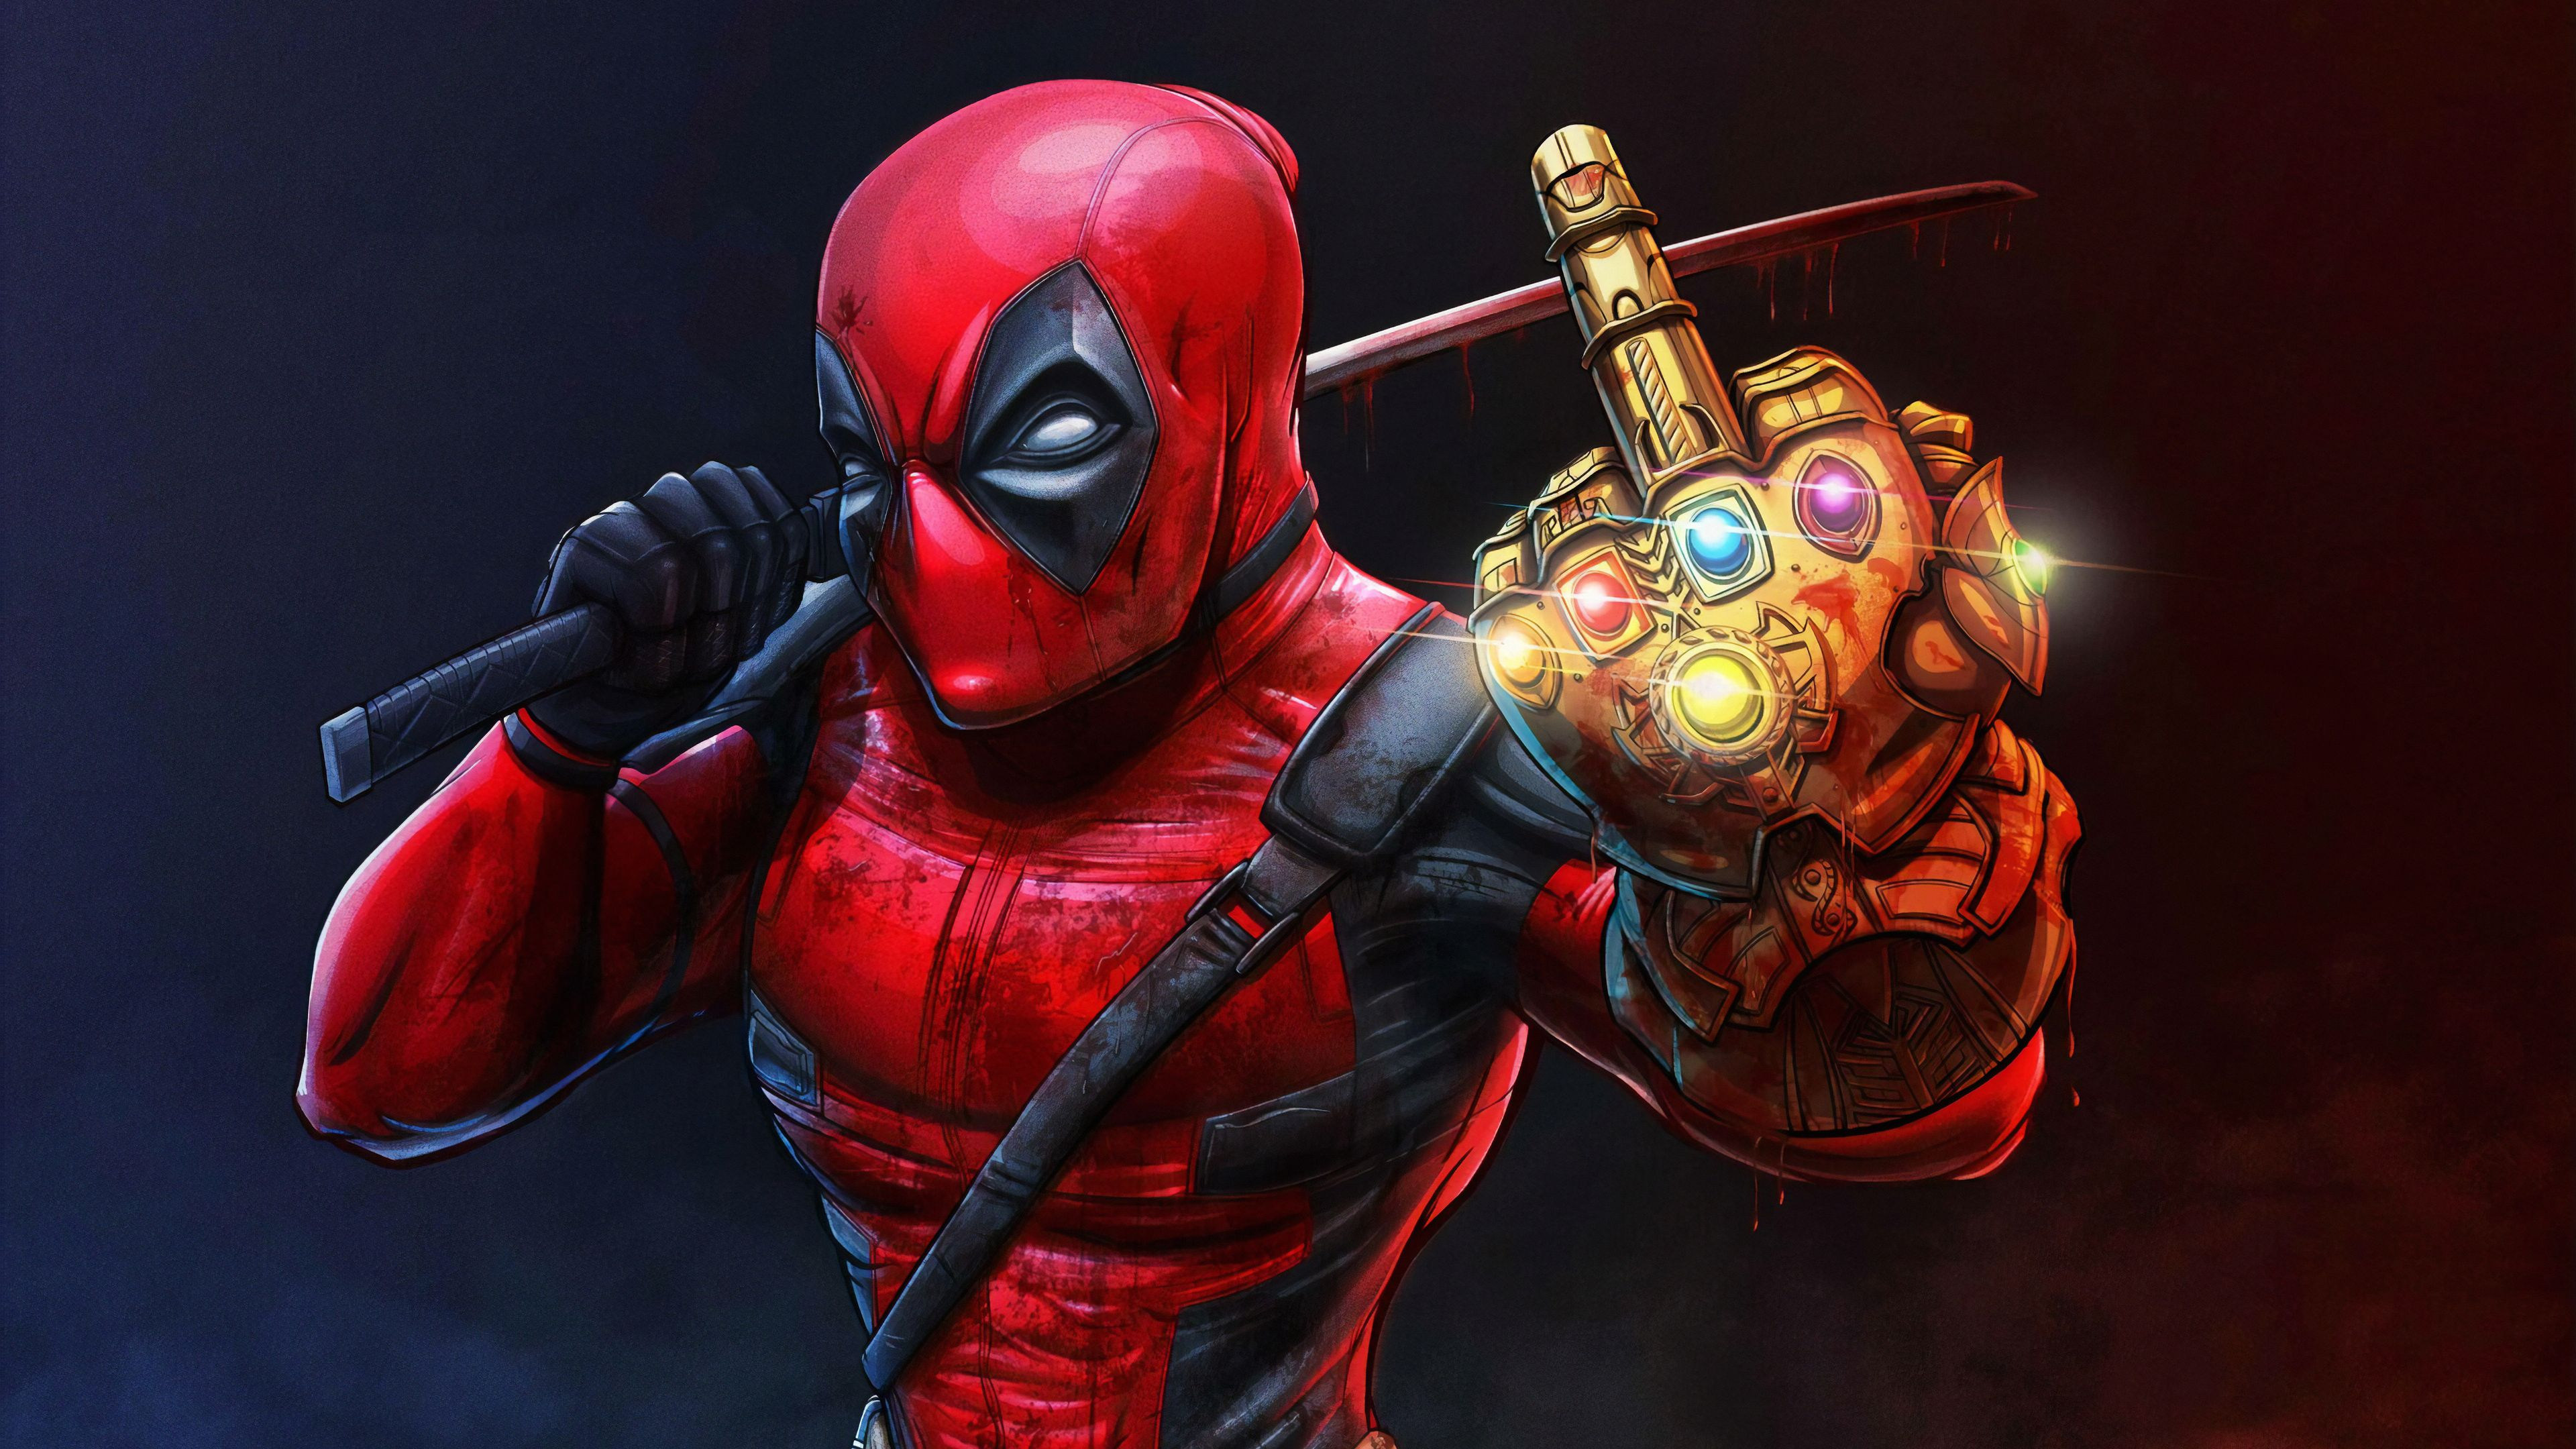 Deadpool With Thanos Infinity Gauntlet Superheroes Wallpapers Hd Wallpapers Digital Art Wallpapers Deadpool Wallpa Deadpool Wallpaper Deadpool Spiderman Art